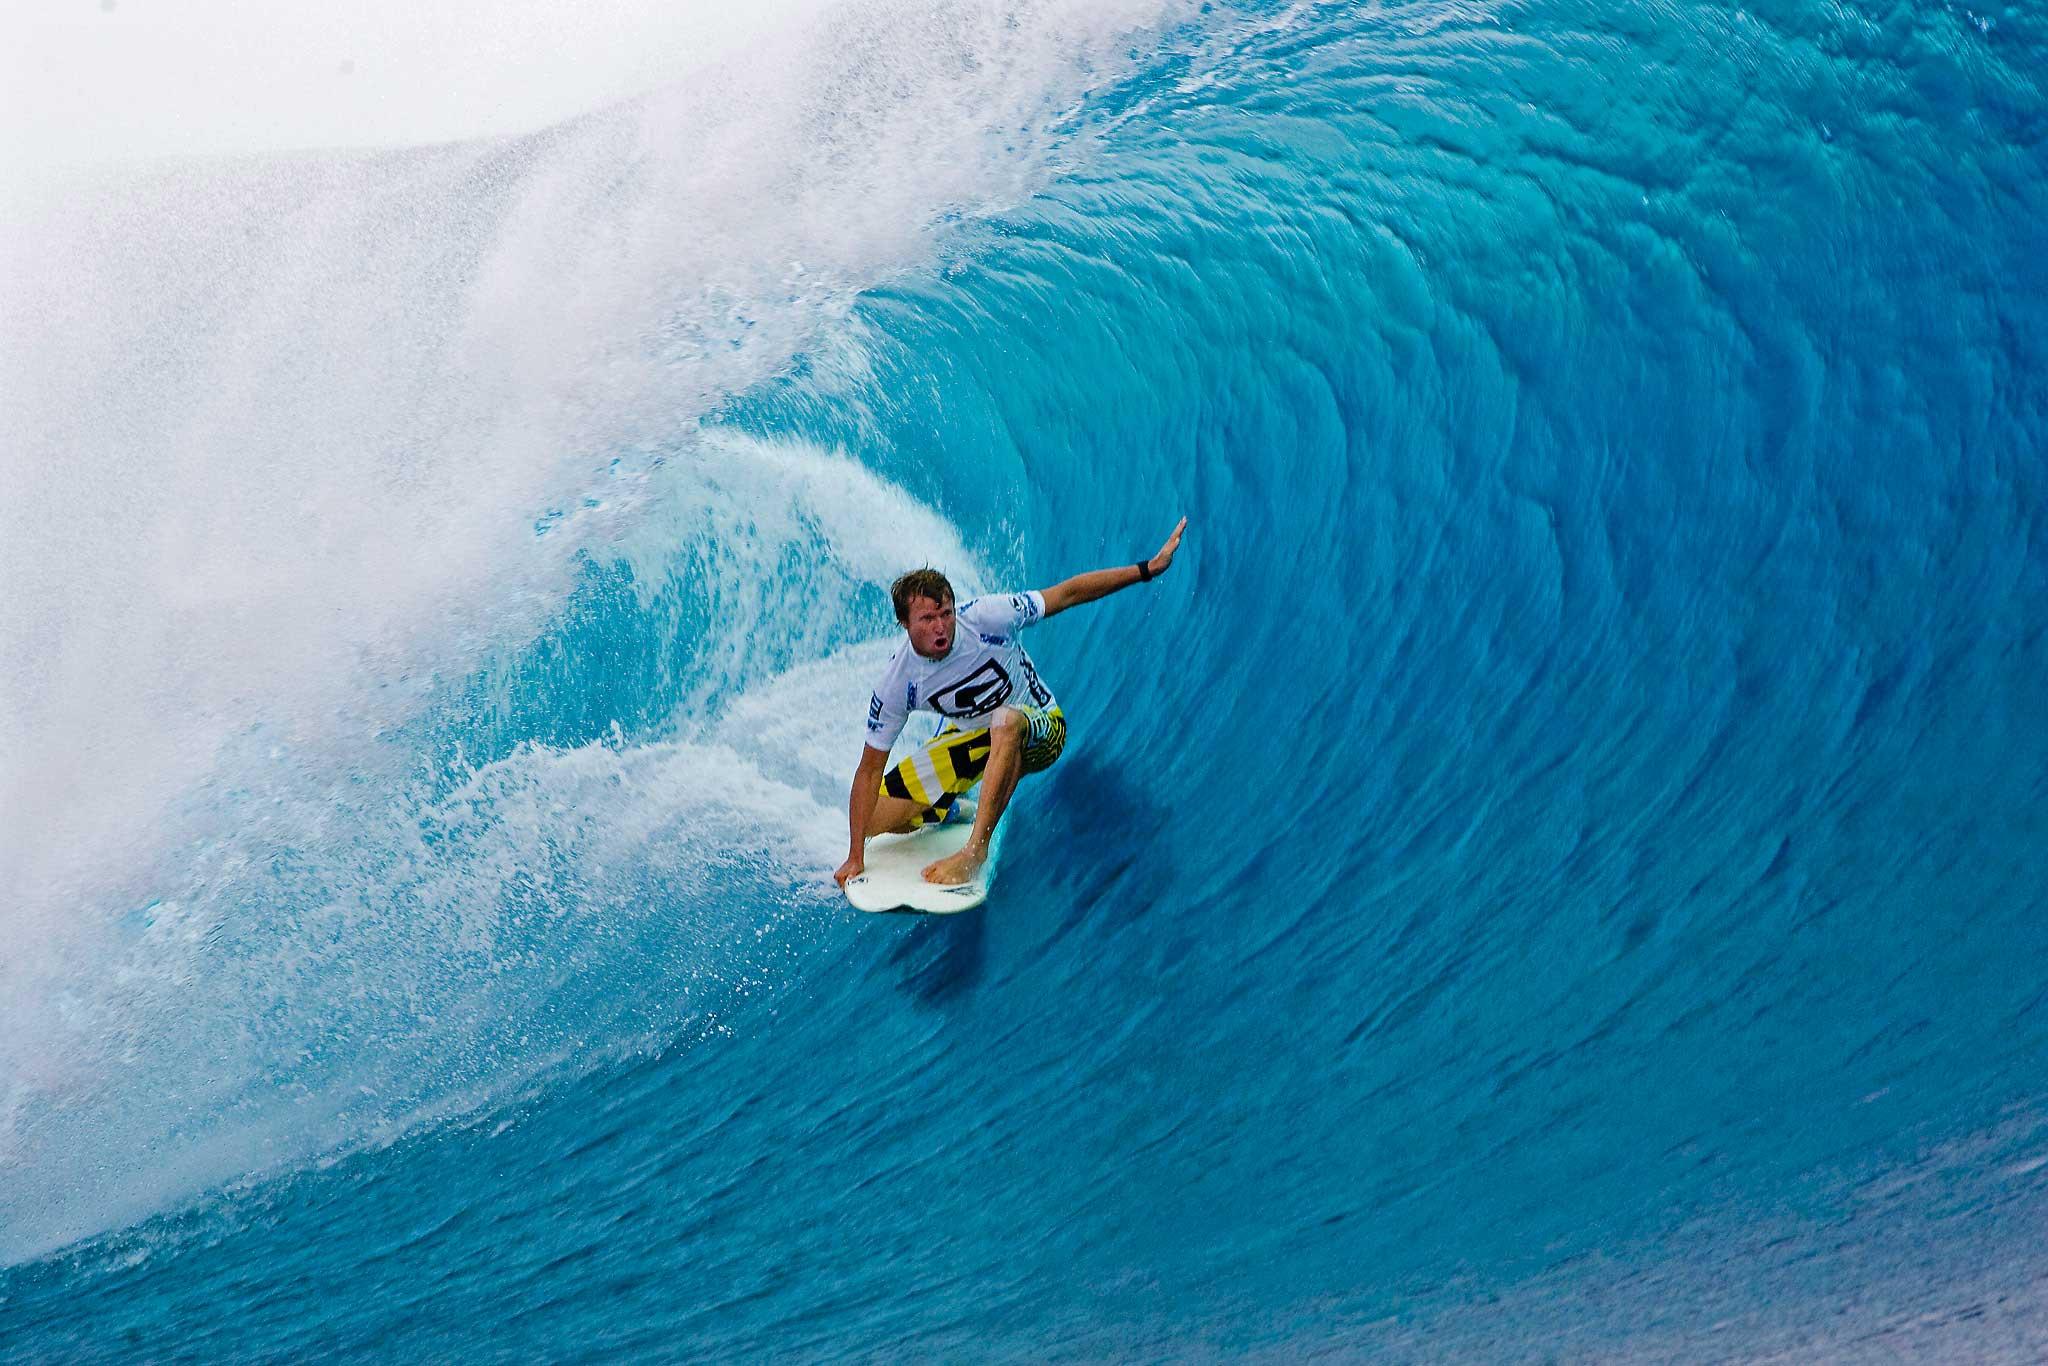 Surf Waves Wallpaper HD wallpaper background 2048x1366